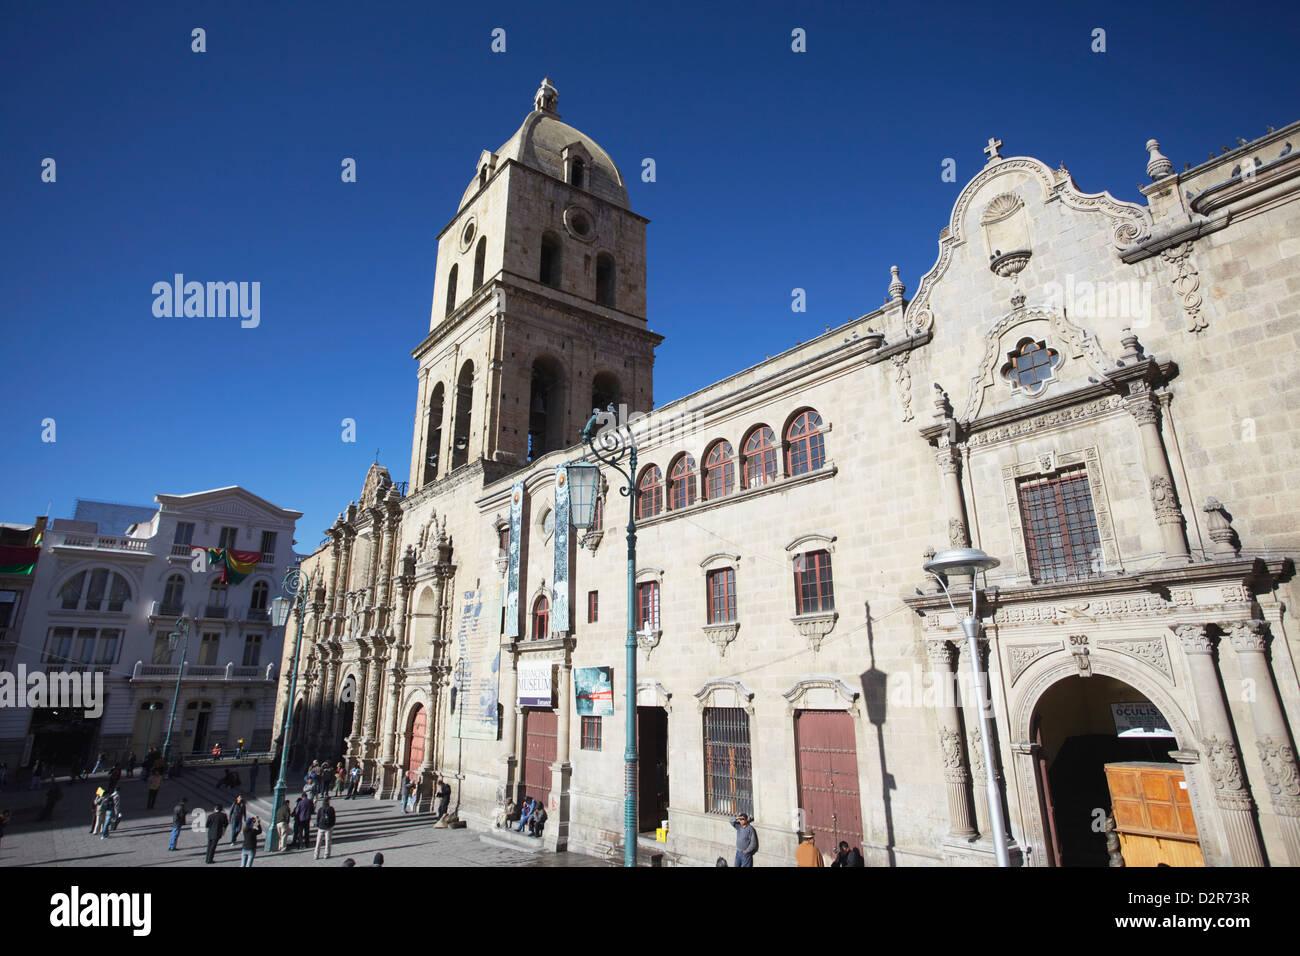 Iglesia de San Francisco in Plaza San Francisco, La Paz, Bolivia, South America - Stock Image